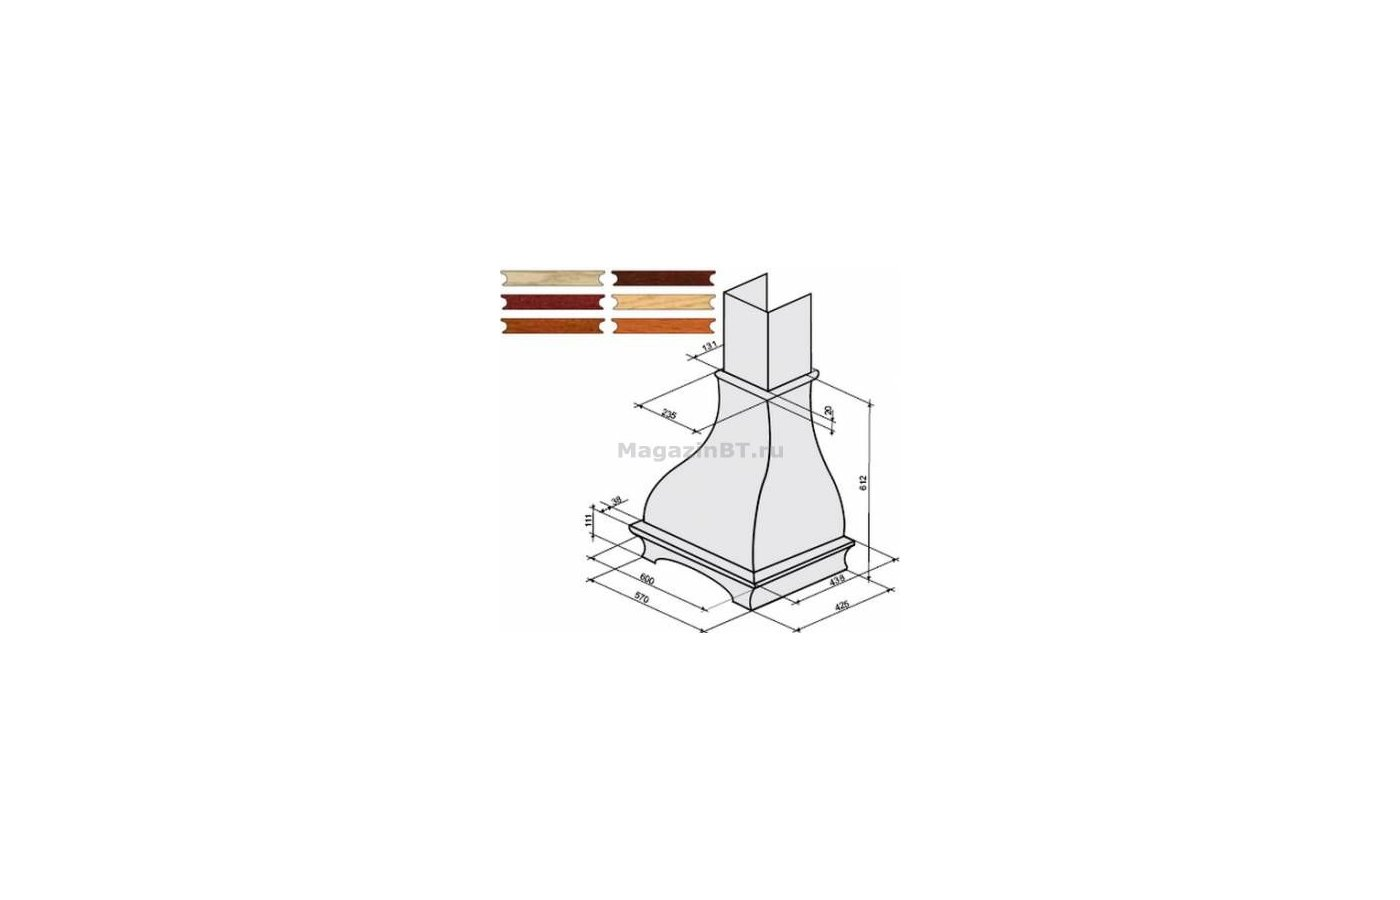 Аксессуар для в/о KRONA комплект багетов в упаковке для Gretta 600 CPB/7 (позит.)